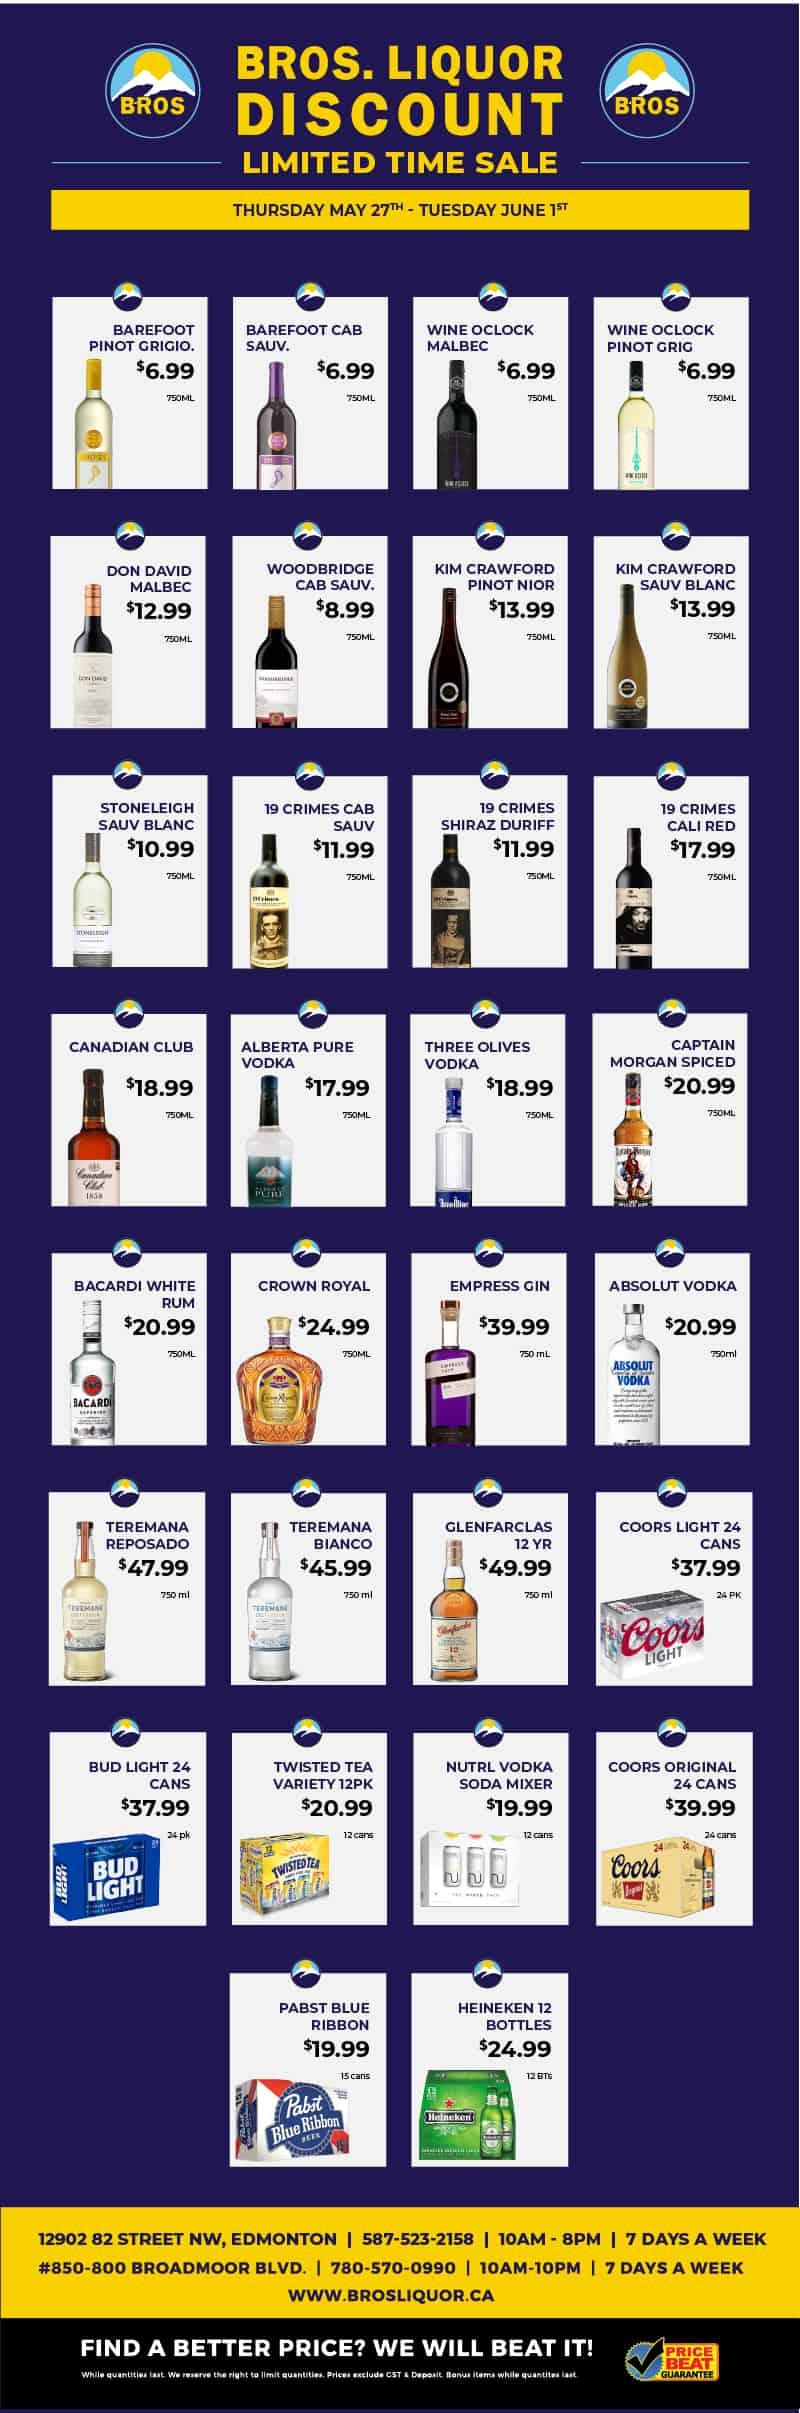 Discount Liquor Flyer May 2021, Sherwood Park, AB